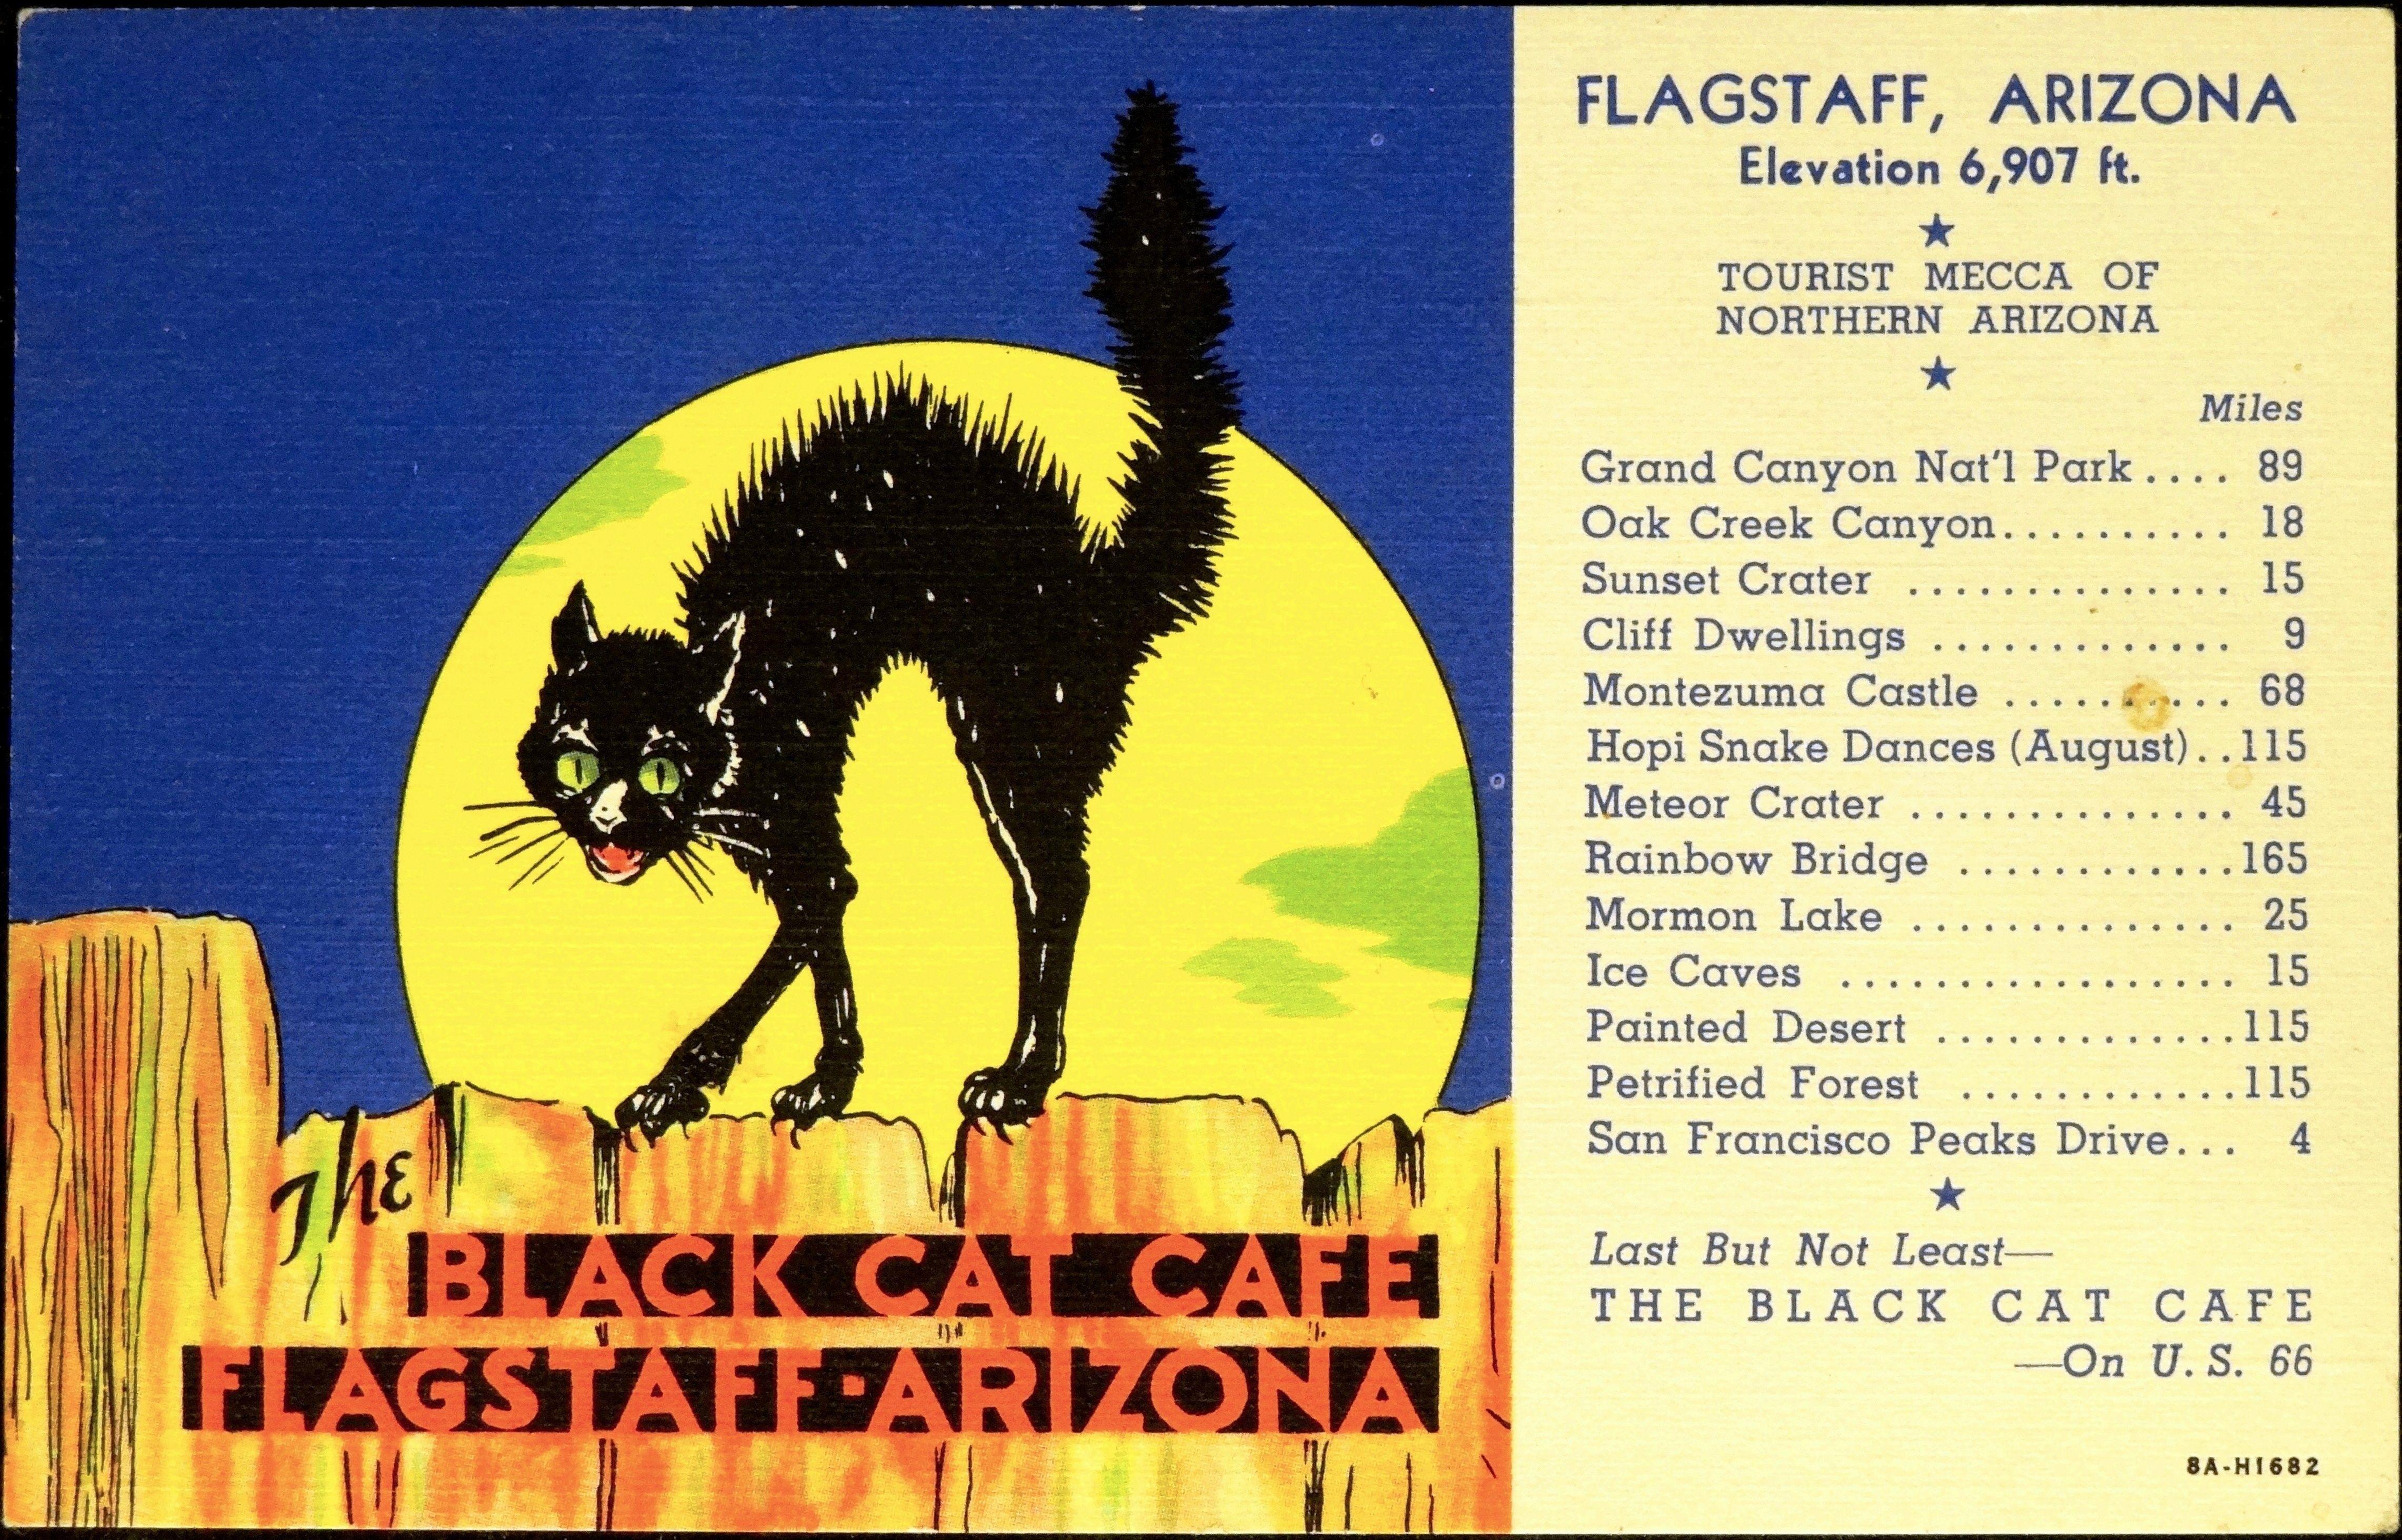 theblackcatcafeflagstaffarizonalinenadvertising